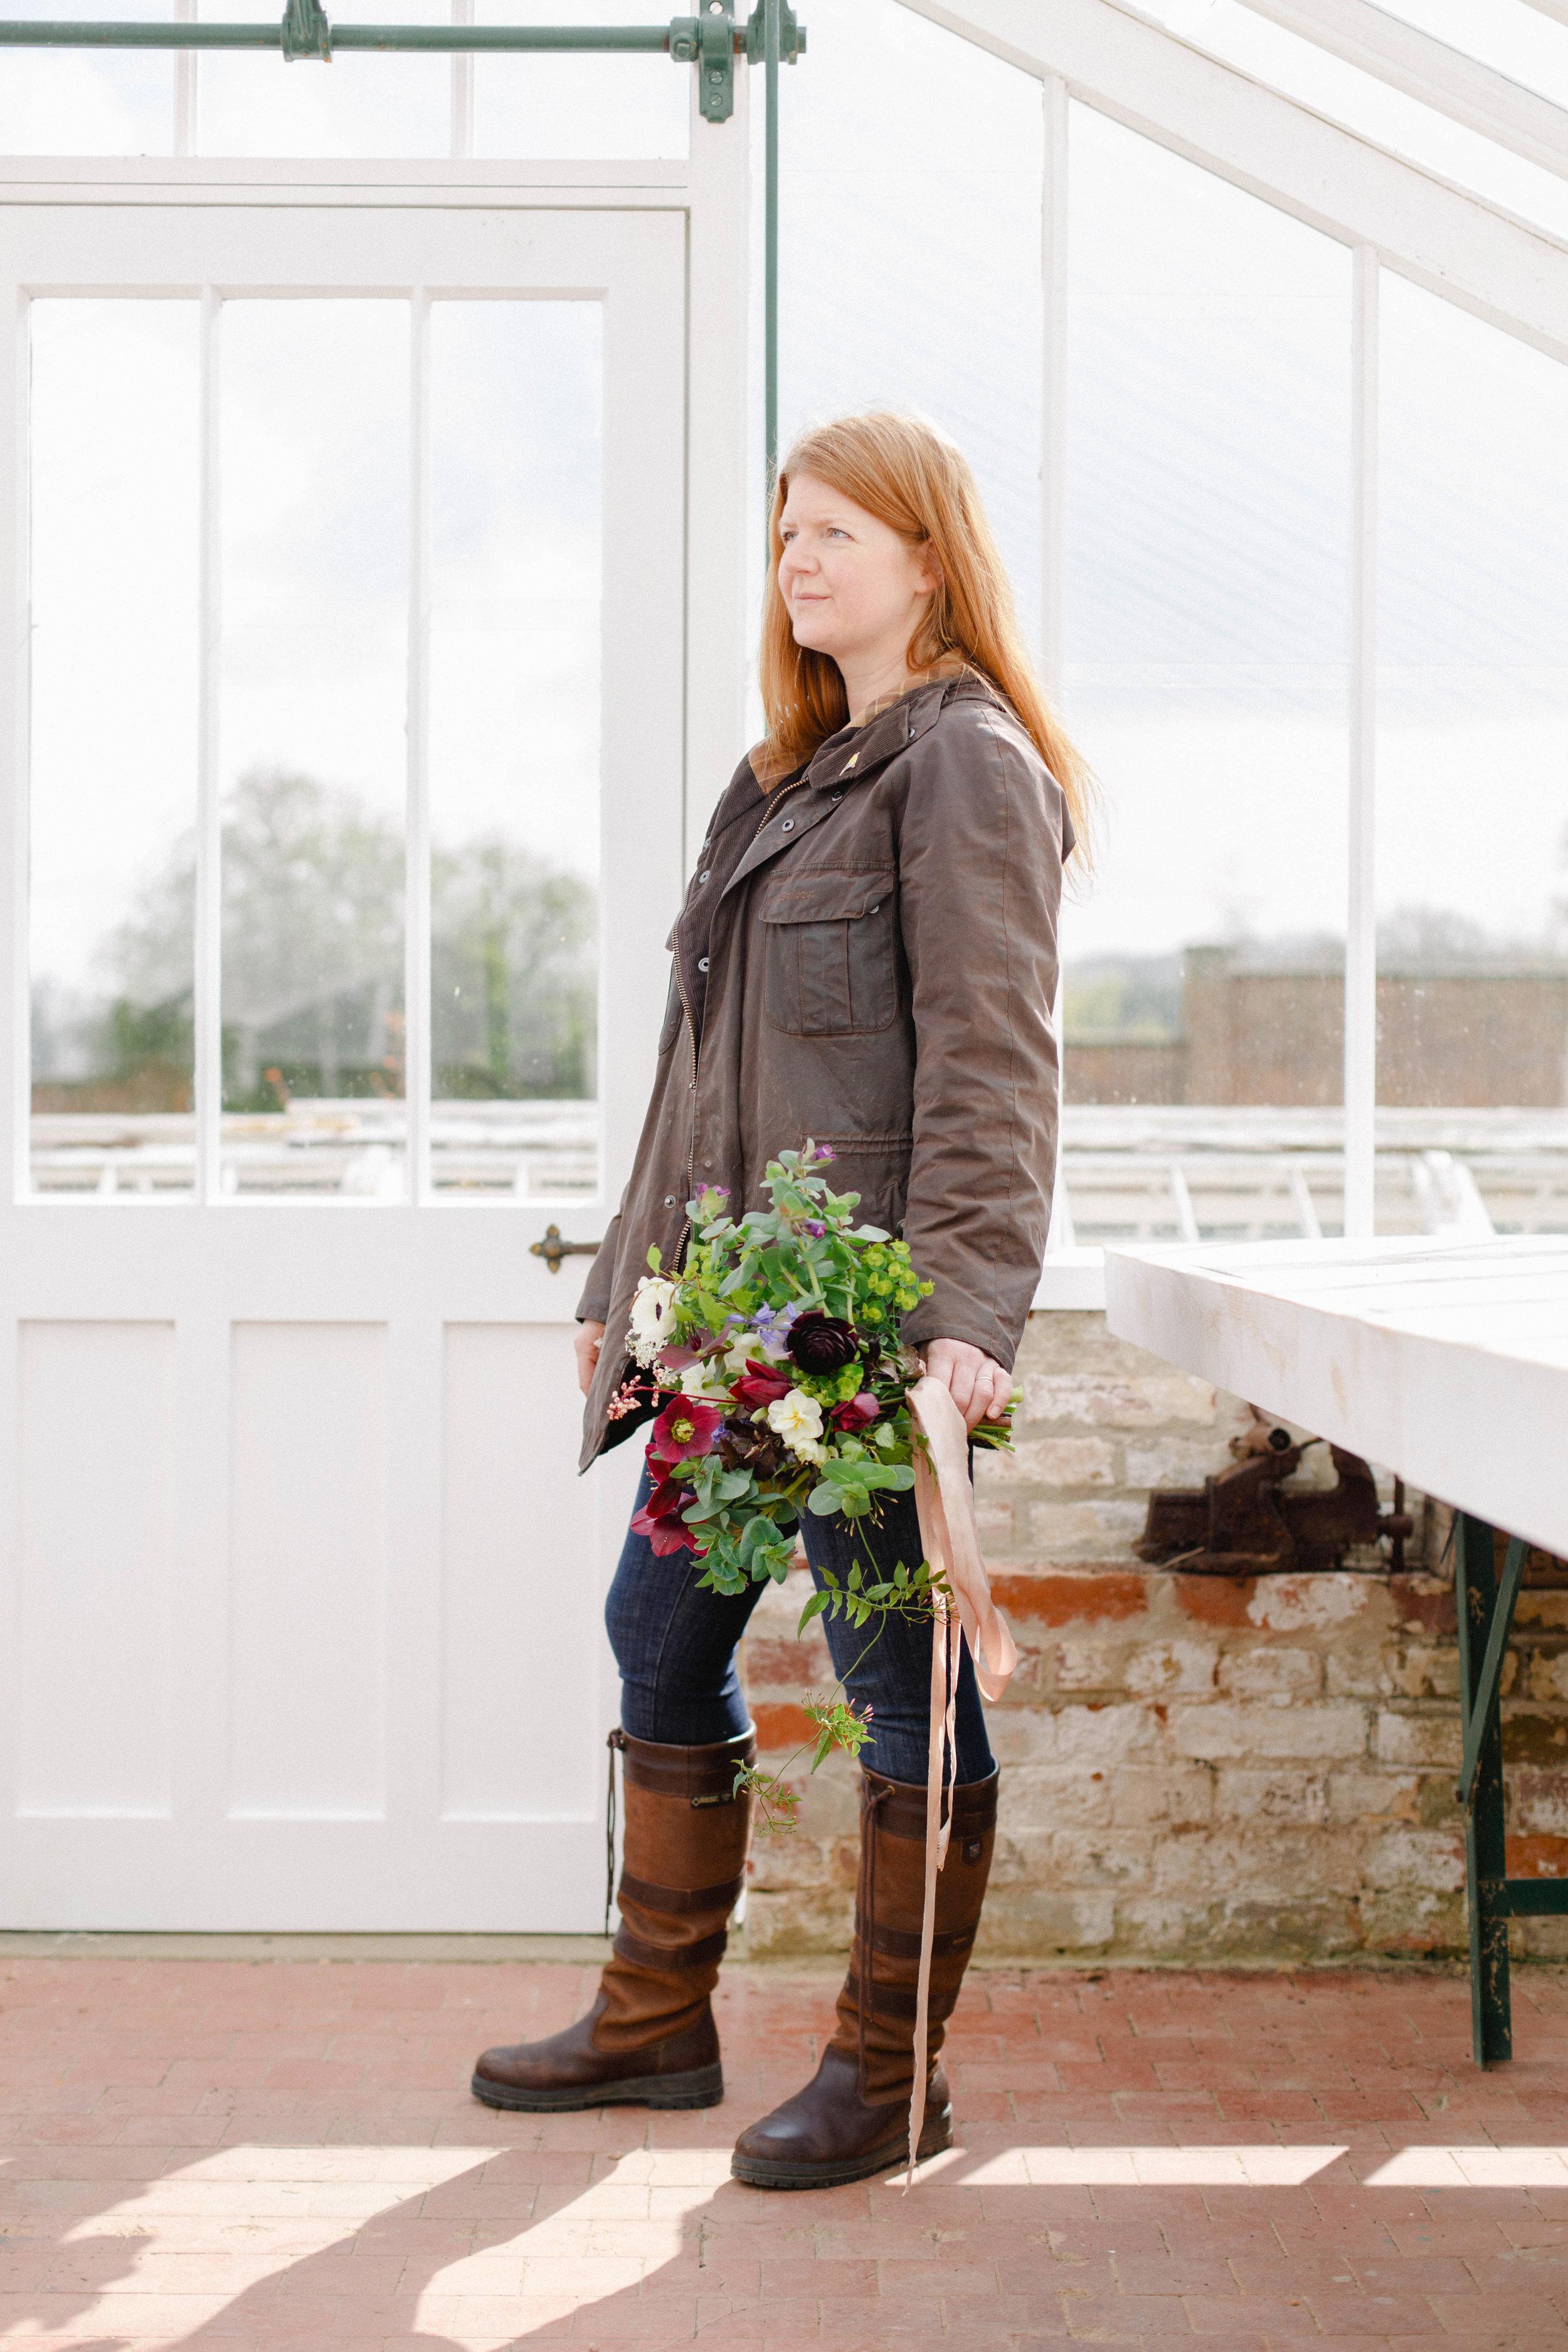 claire-graham-photography-bloomologie-wallednursery-60.JPG